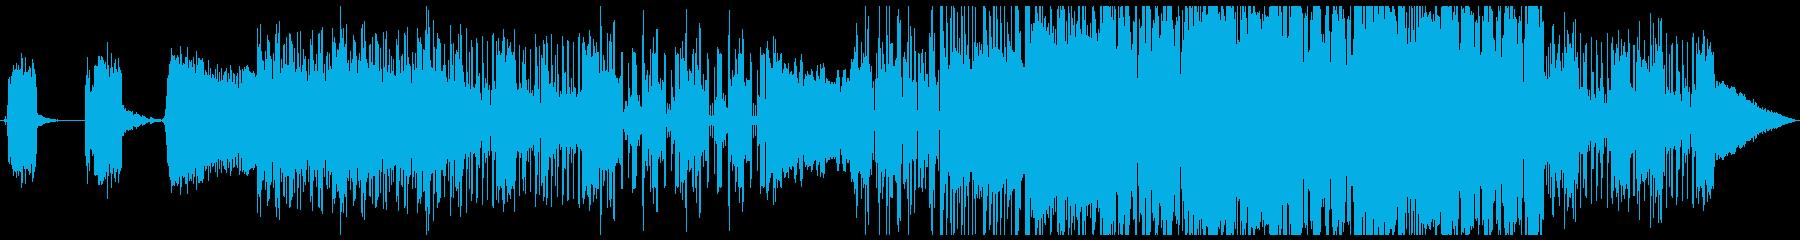 SCIFIテイストな、近未来感漂う音の再生済みの波形